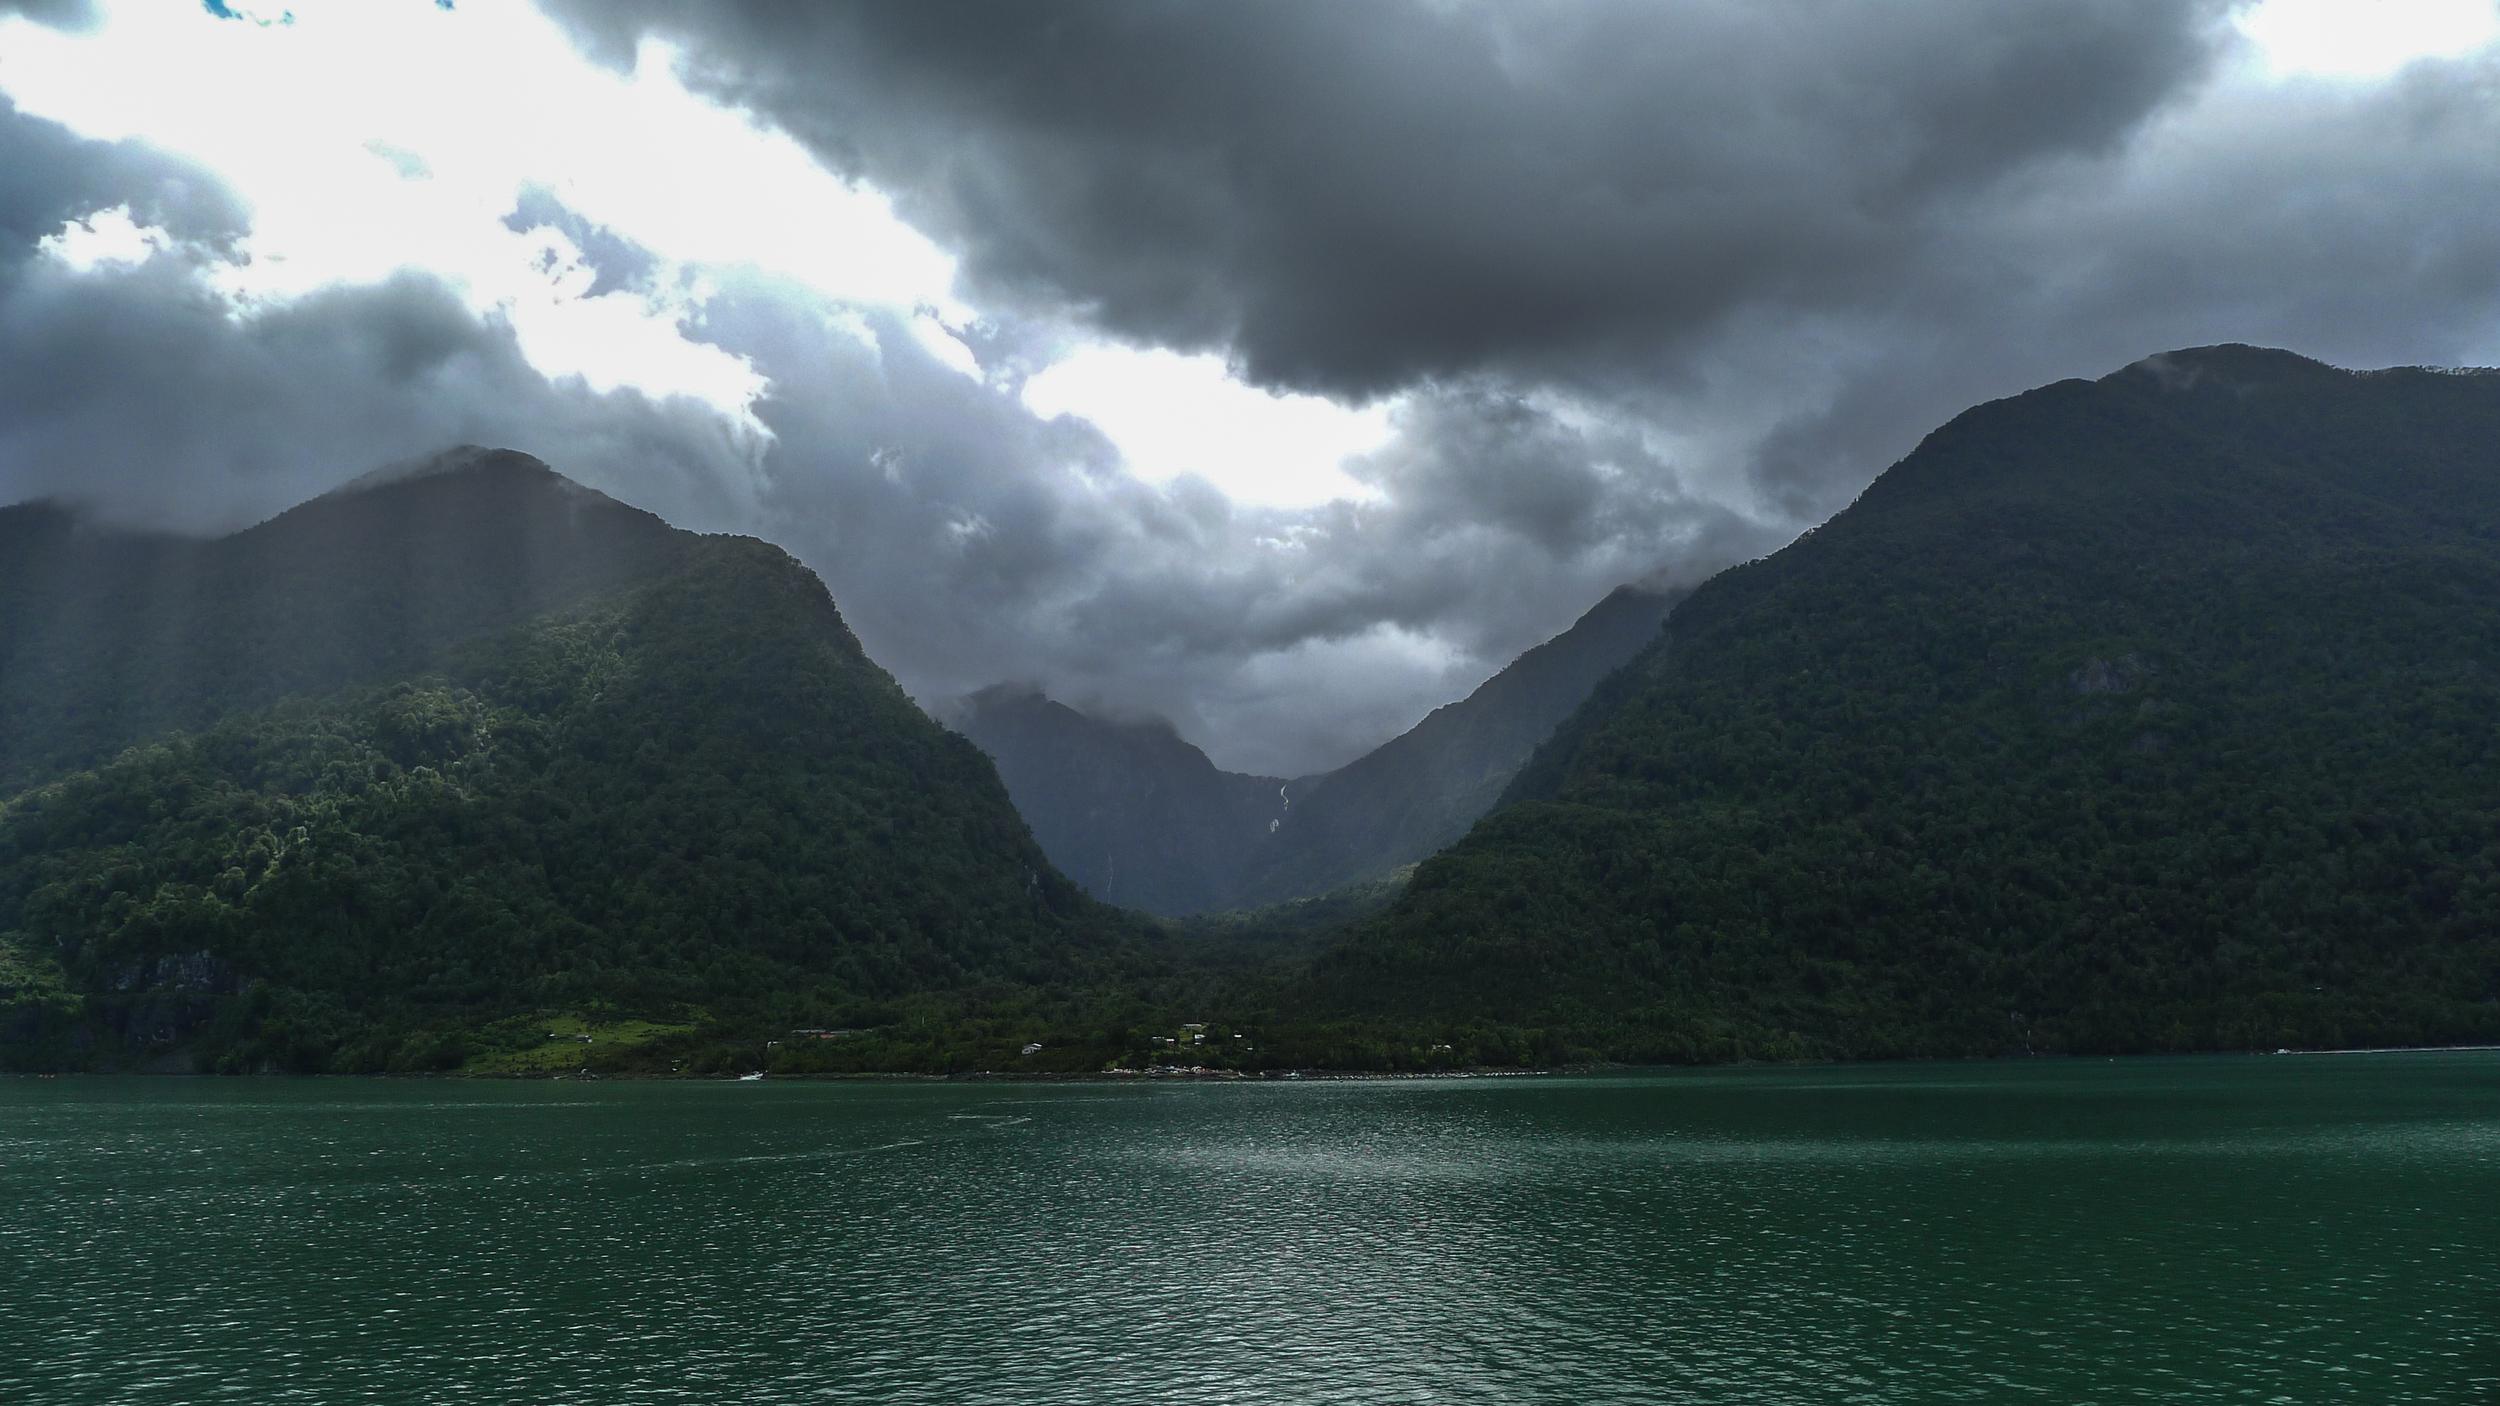 Pumalin ferry ride; Pumalin nature, landscapes, fiords